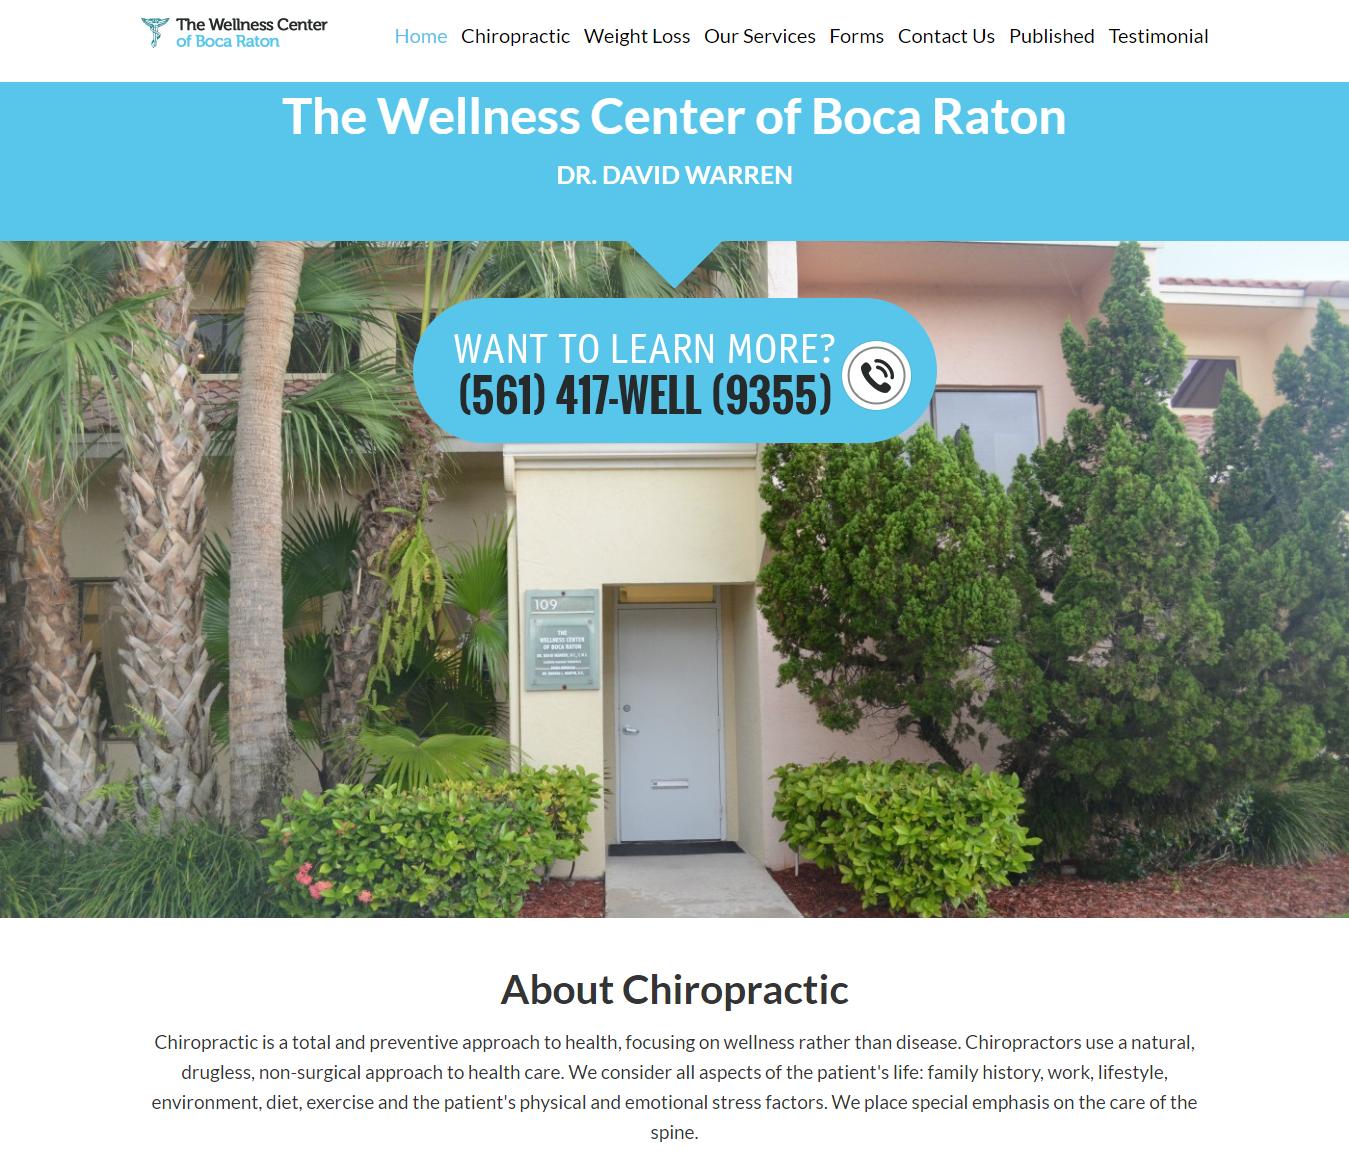 Boca Chiropractor Dr. Dave Warren of The Wellness Center of Boca Raton